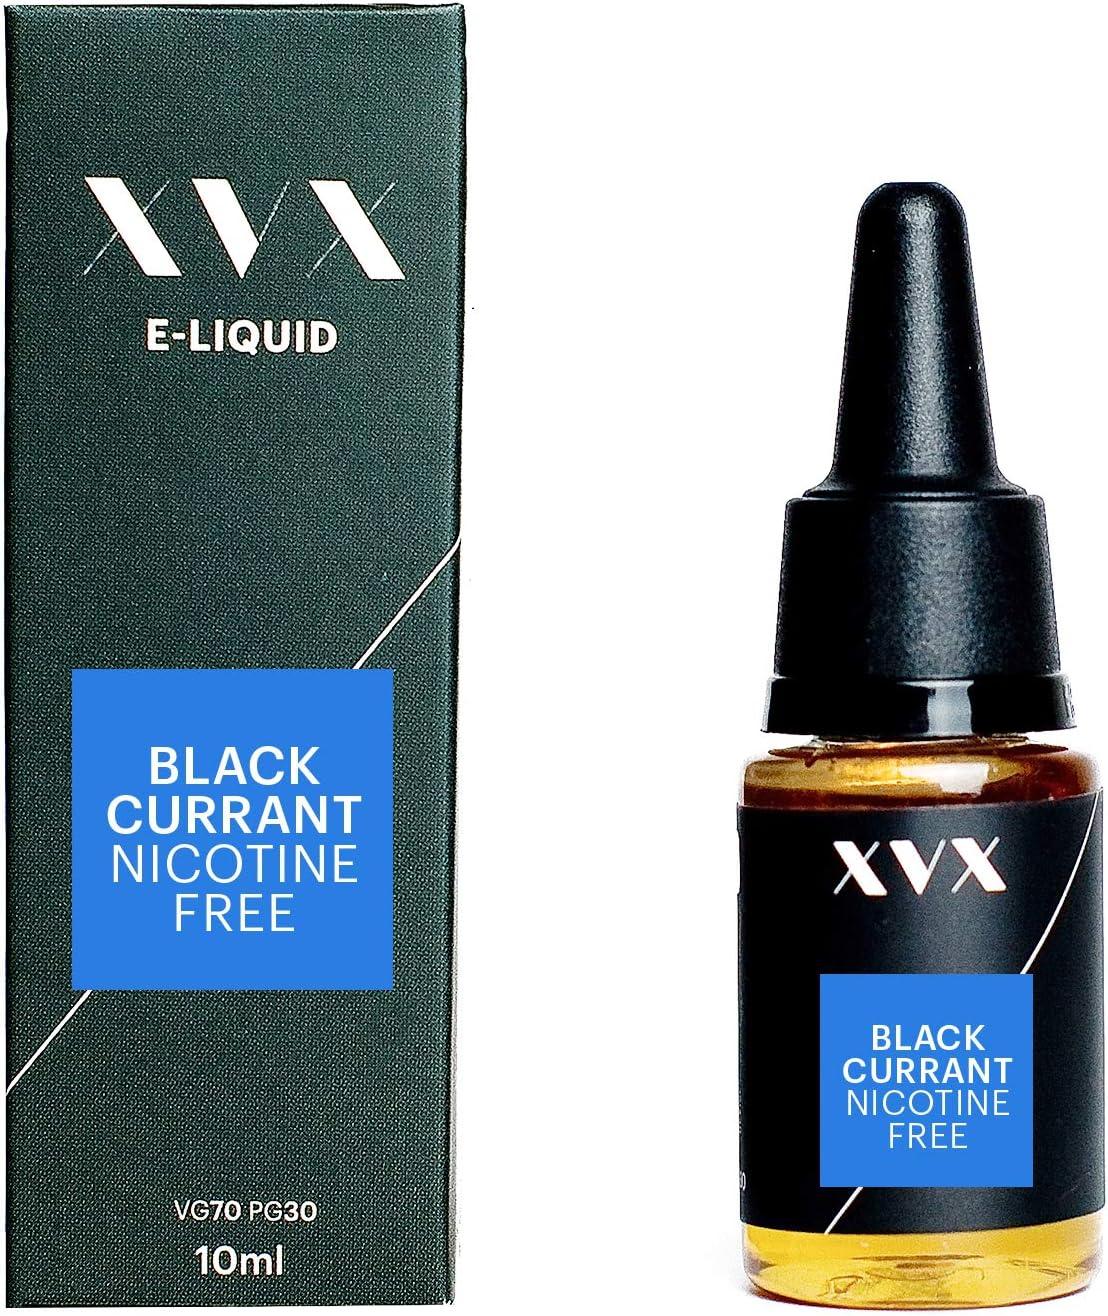 XVX E Liquid Blackcurrant Flavour Electronic Liquid For Vape Pen Cigarettes E Cigarette Shisha Vapouriser Liquid 10ml Nicotine Free Bottle Needle Tip Ecig E Cig